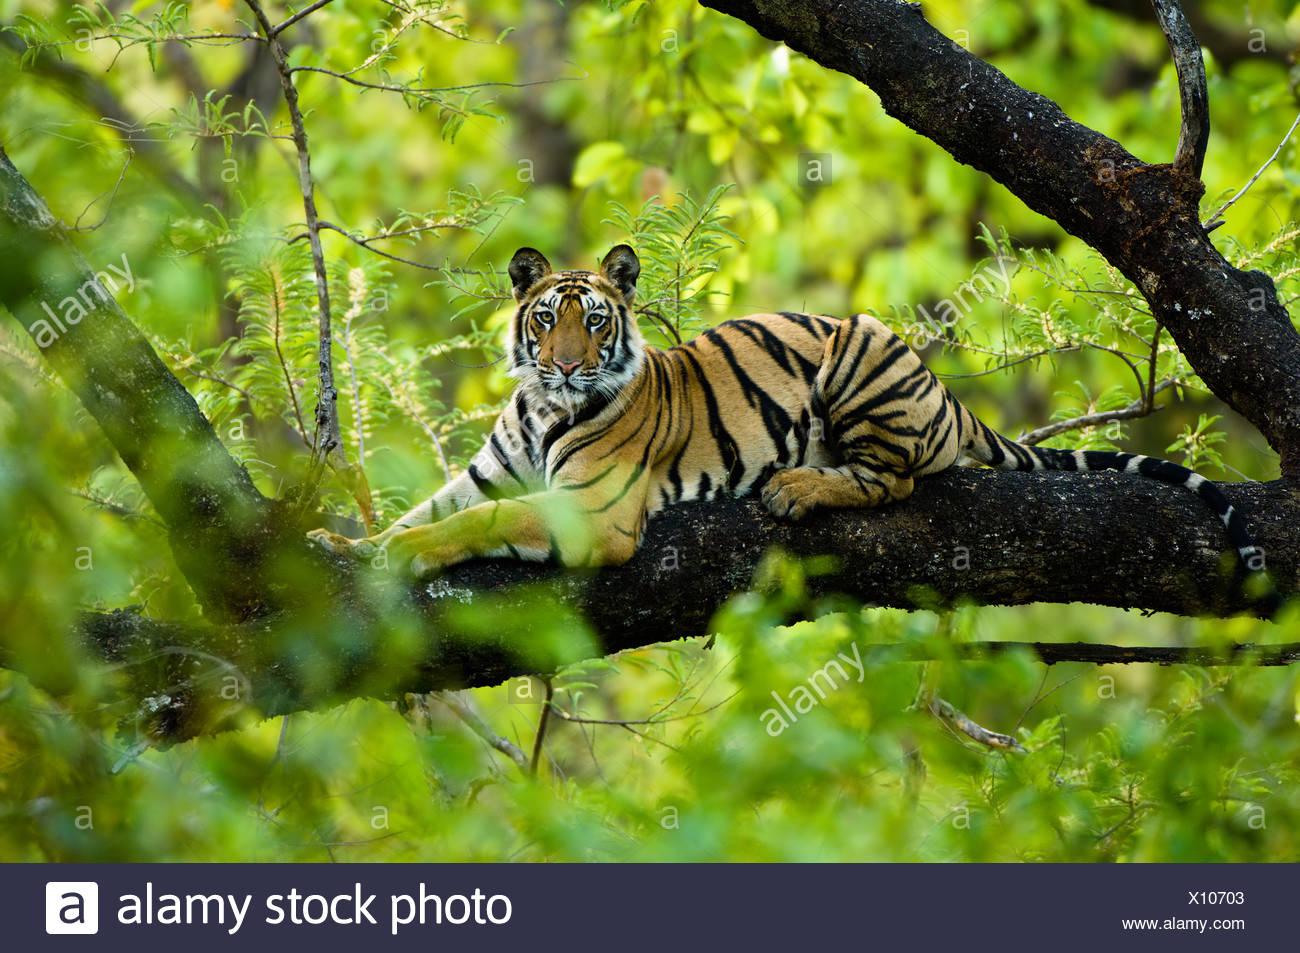 Adolescente varón Tigre de Bengala (aproximadamente 15 meses) descansando arriba de un árbol. Bandhavgarh NP, Madhya Pradesh, India. Imagen De Stock